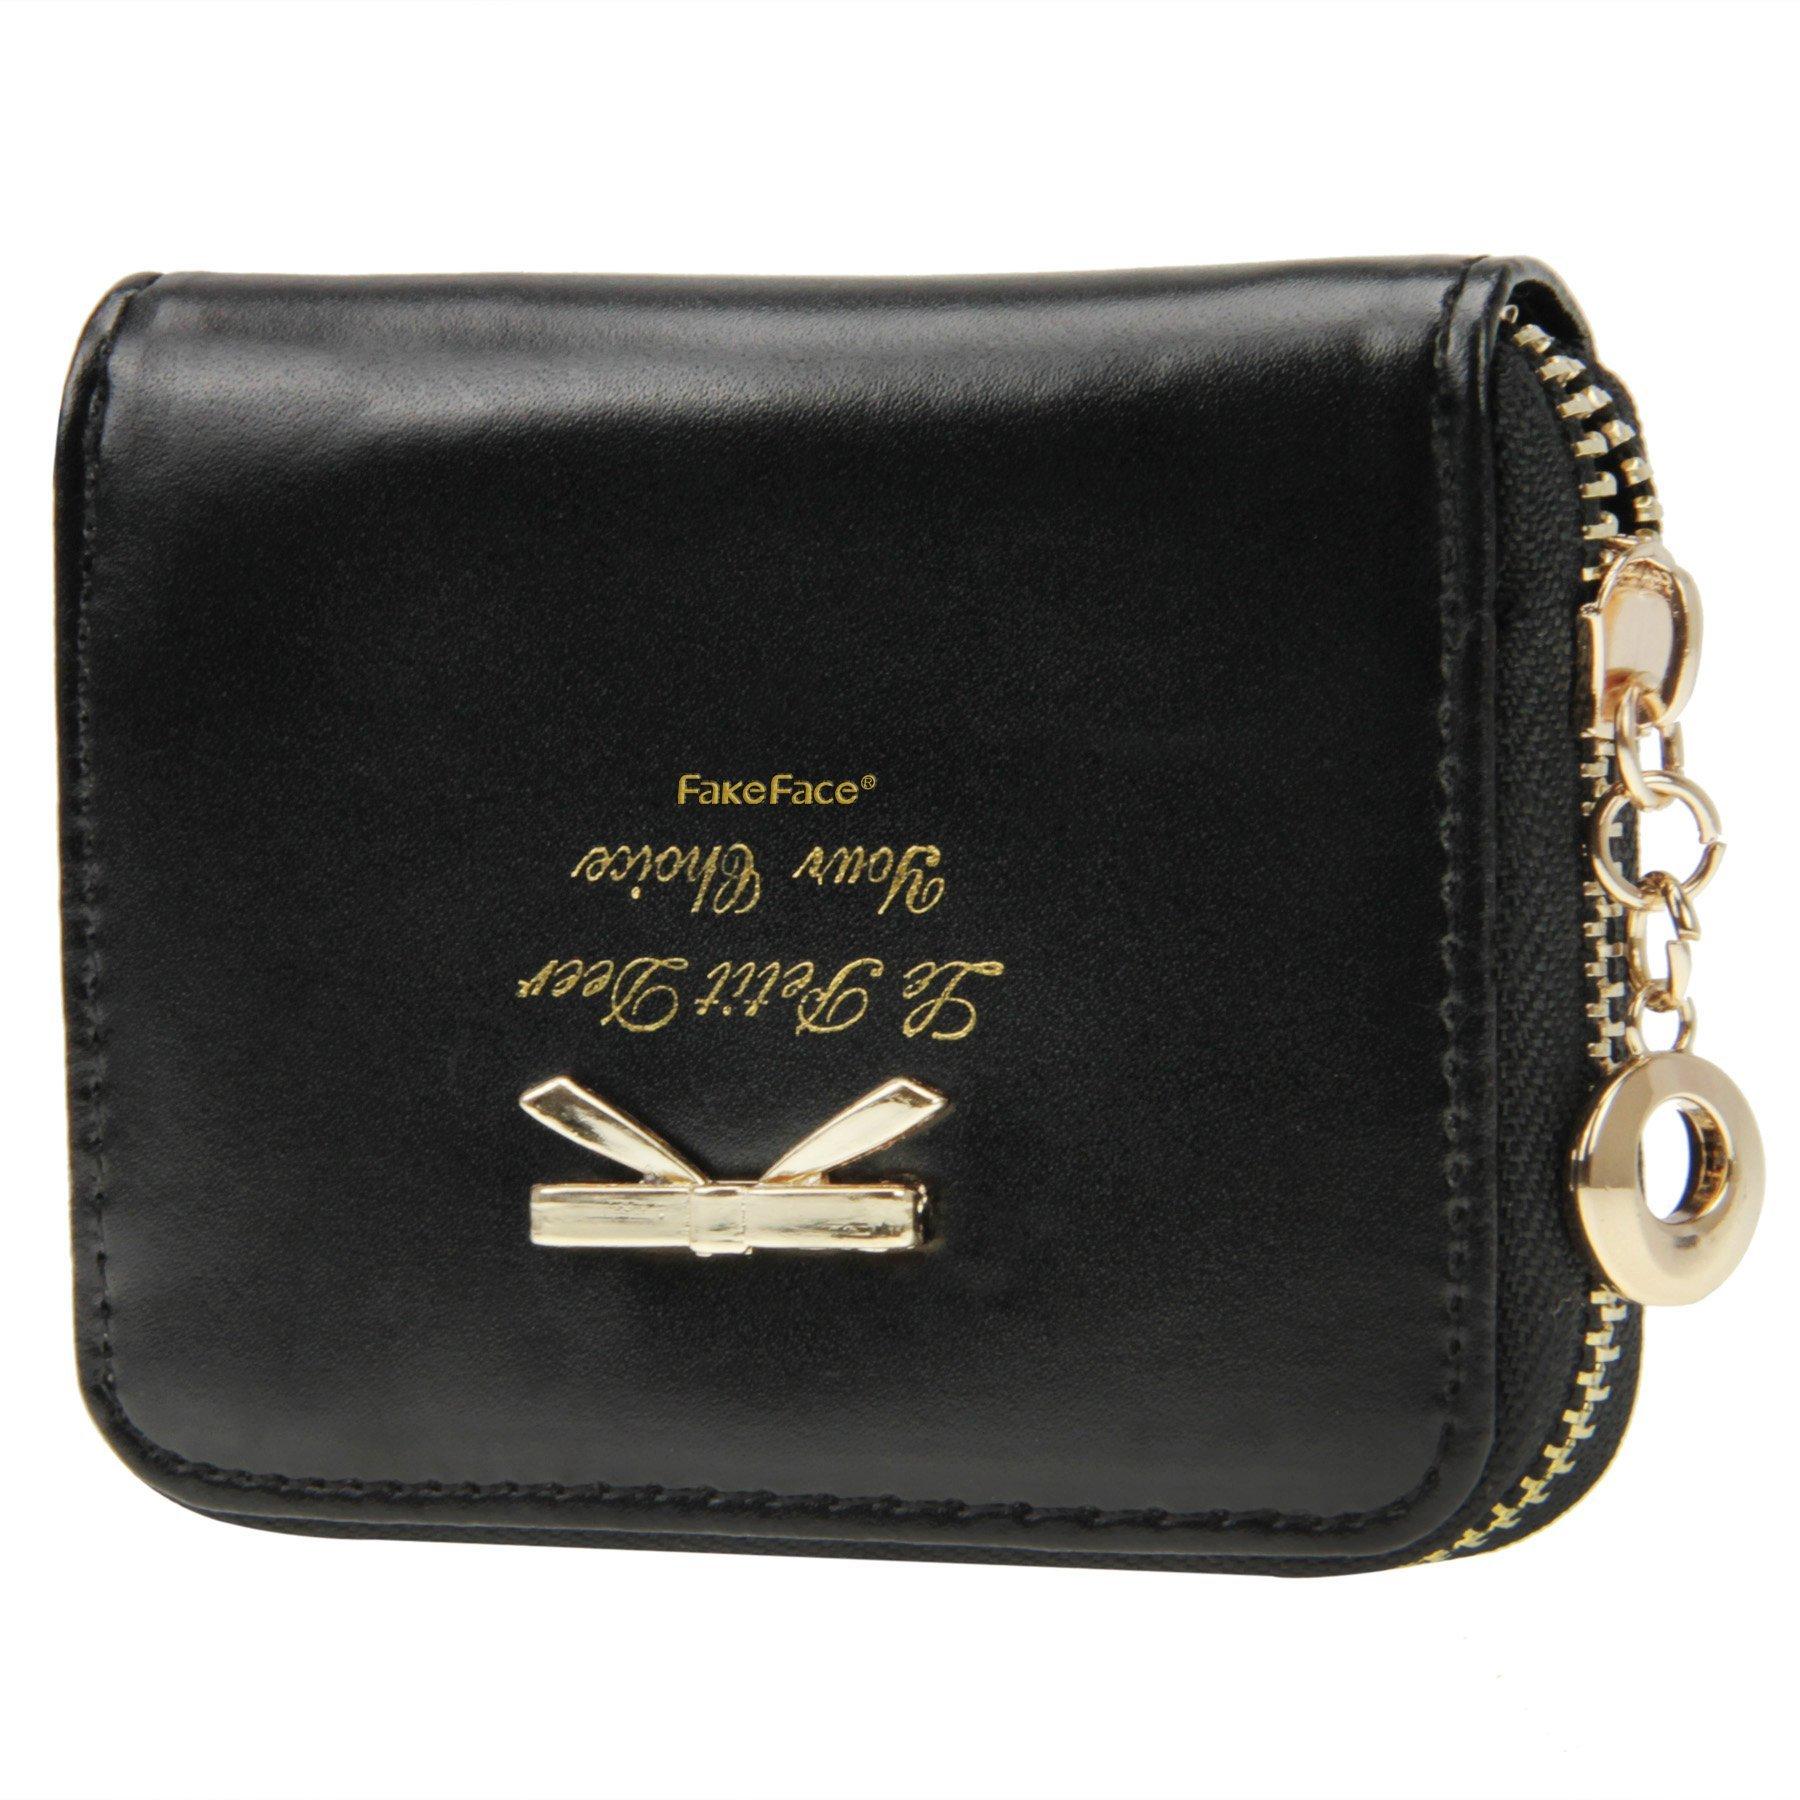 Women Girls Cute Bowknot Waterproof PU Leather Fold Mini Short Wallet Coin Purse Zipper Card Case Holder Clutch Small Handbag Nice Gift